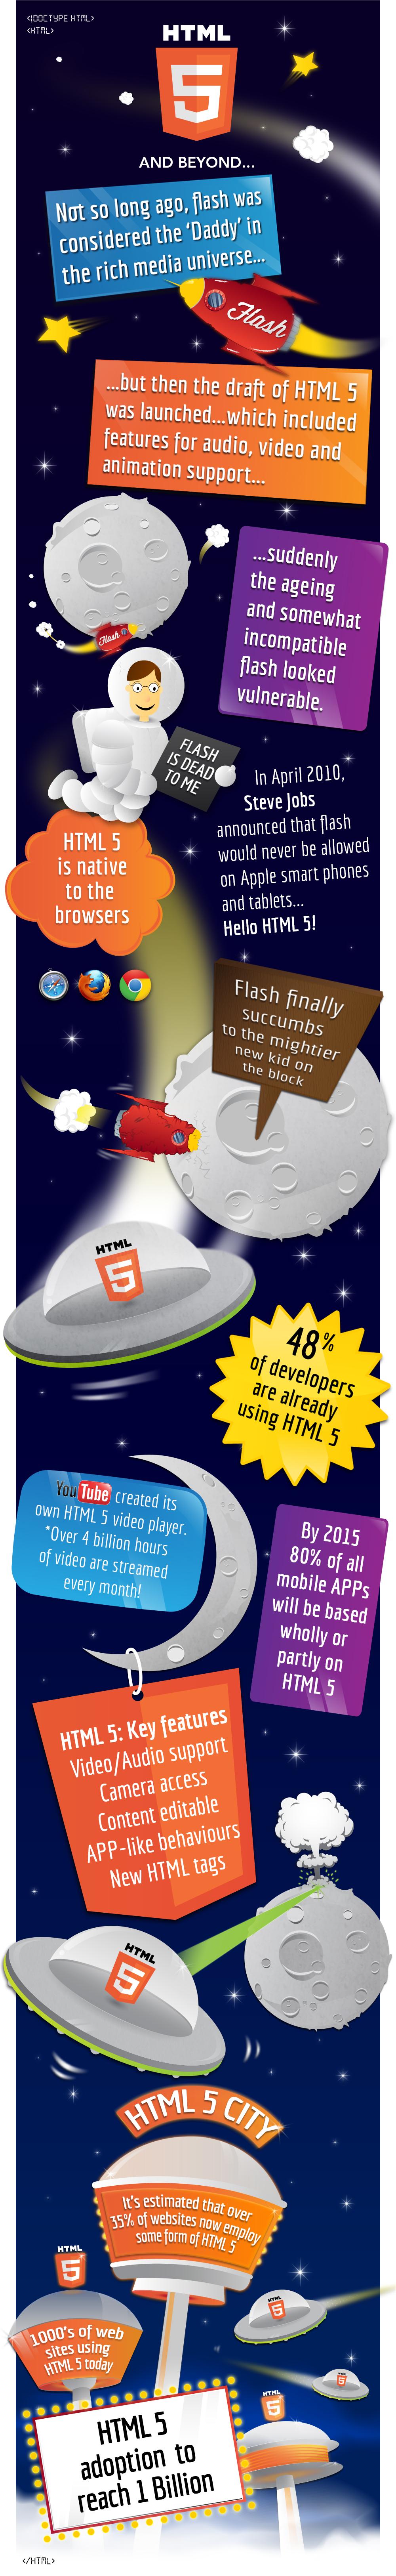 HTML 5 & Beyond